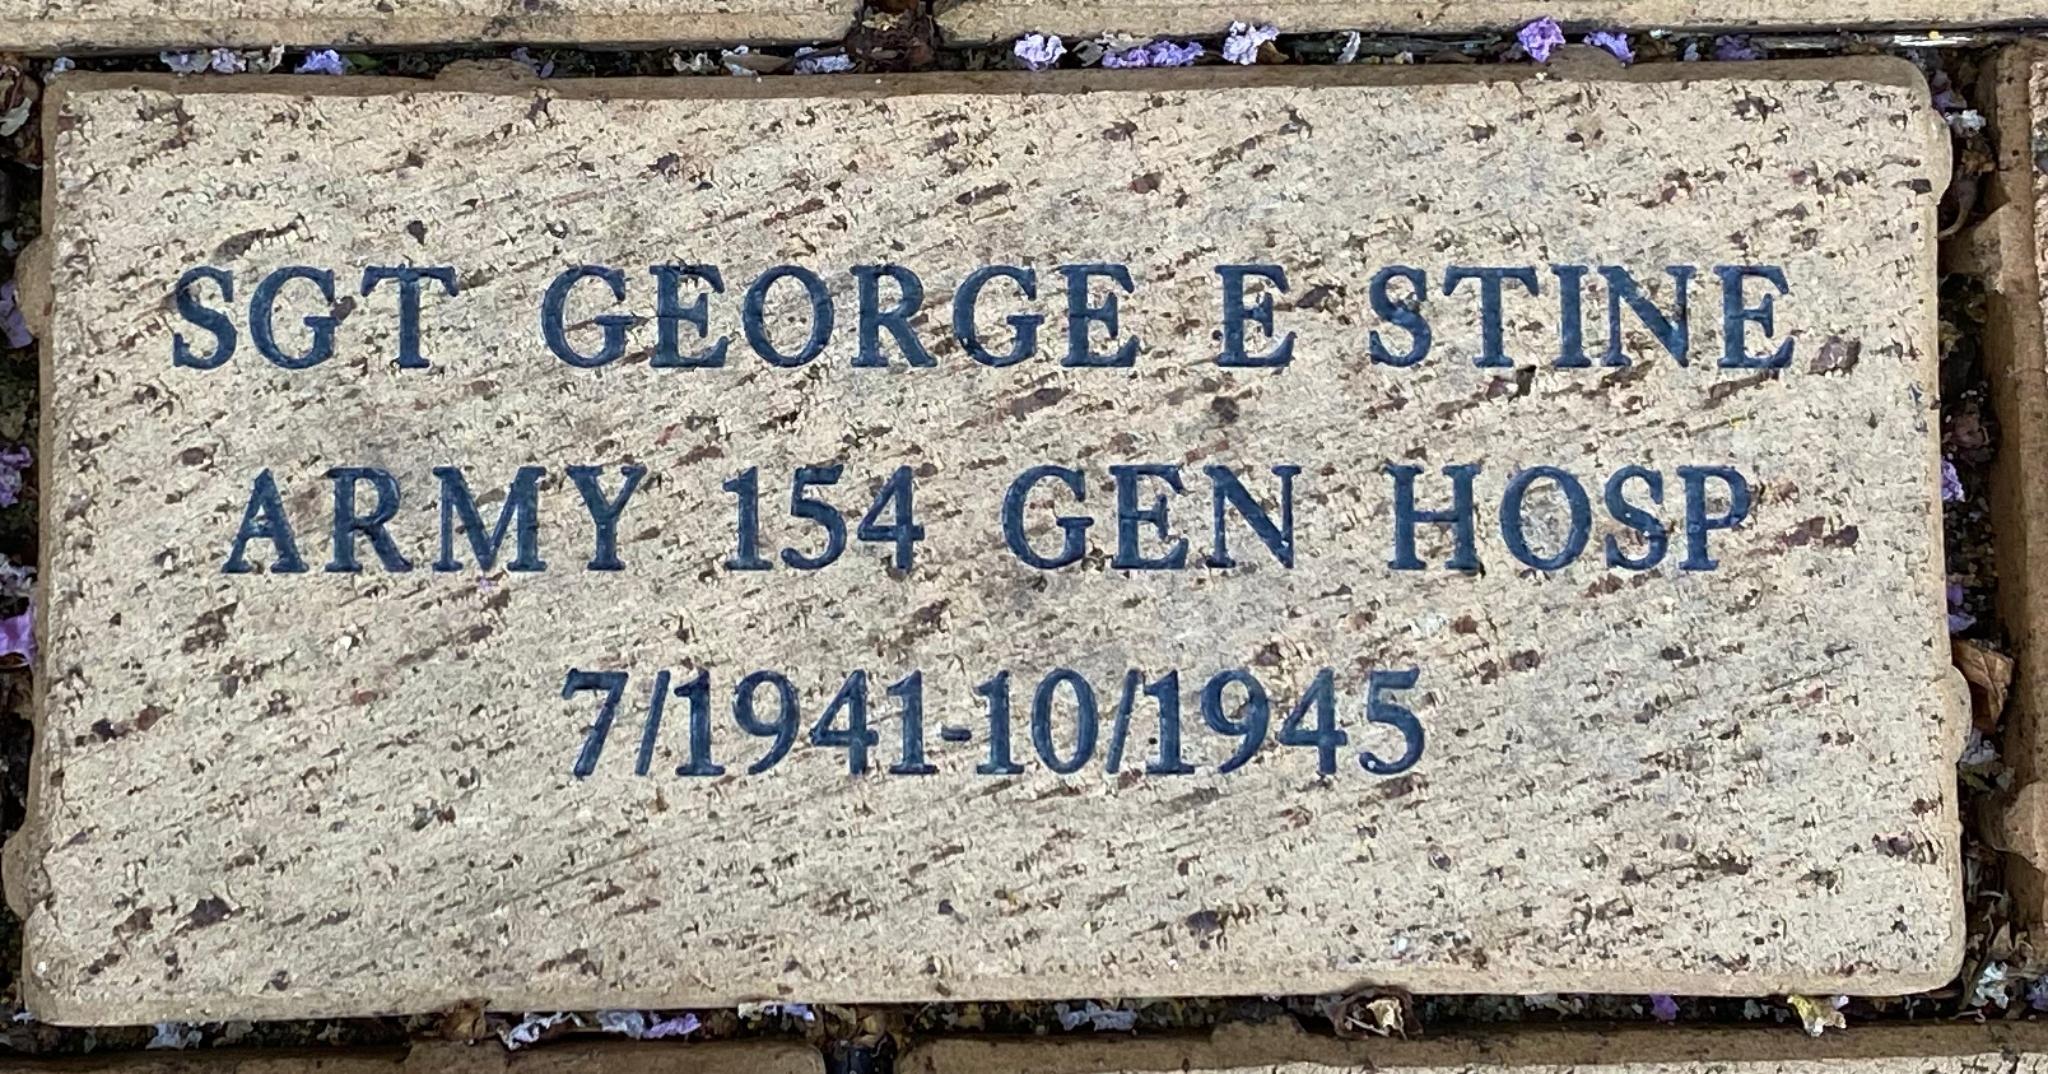 SGT GEORGE E STINE ARMY 154 GEN HOSP 7/1941-10/1945